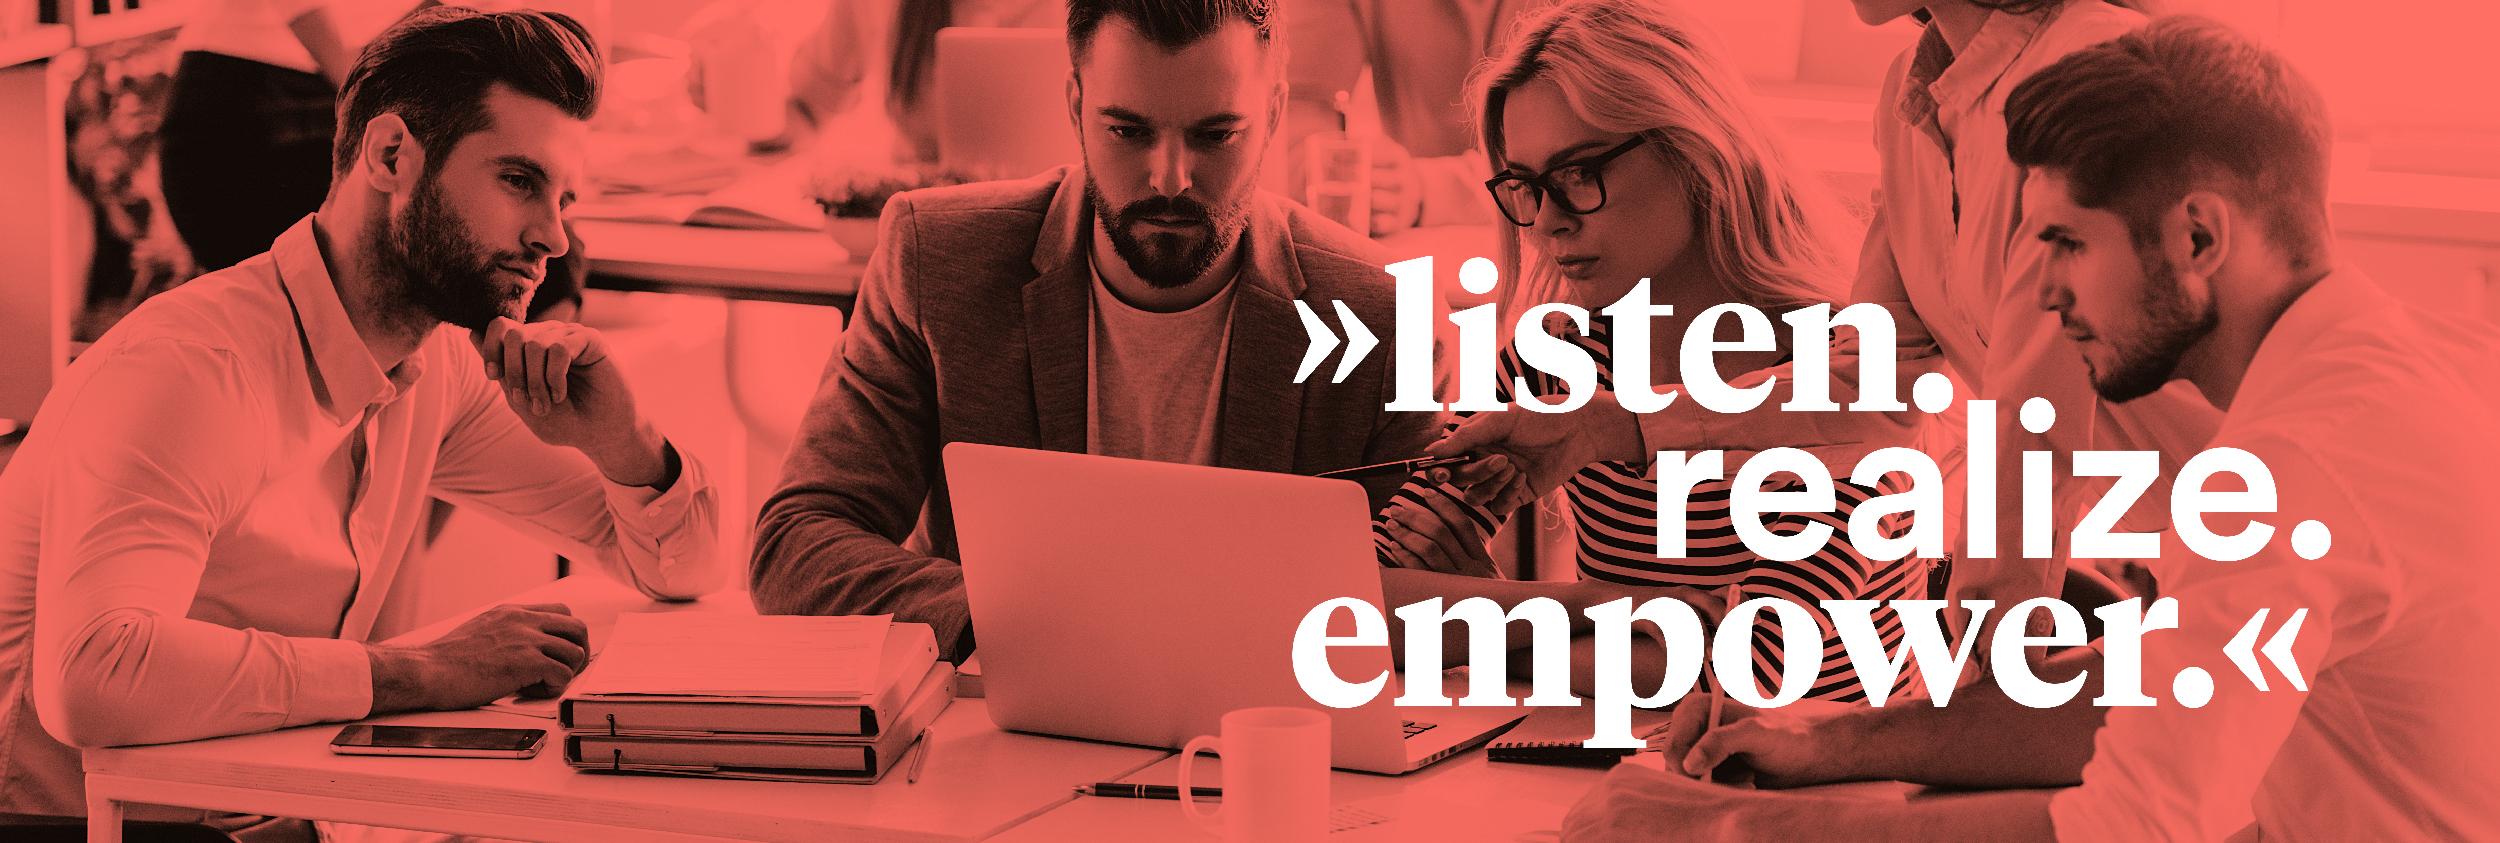 listen_realize_empower_rot2.jpg